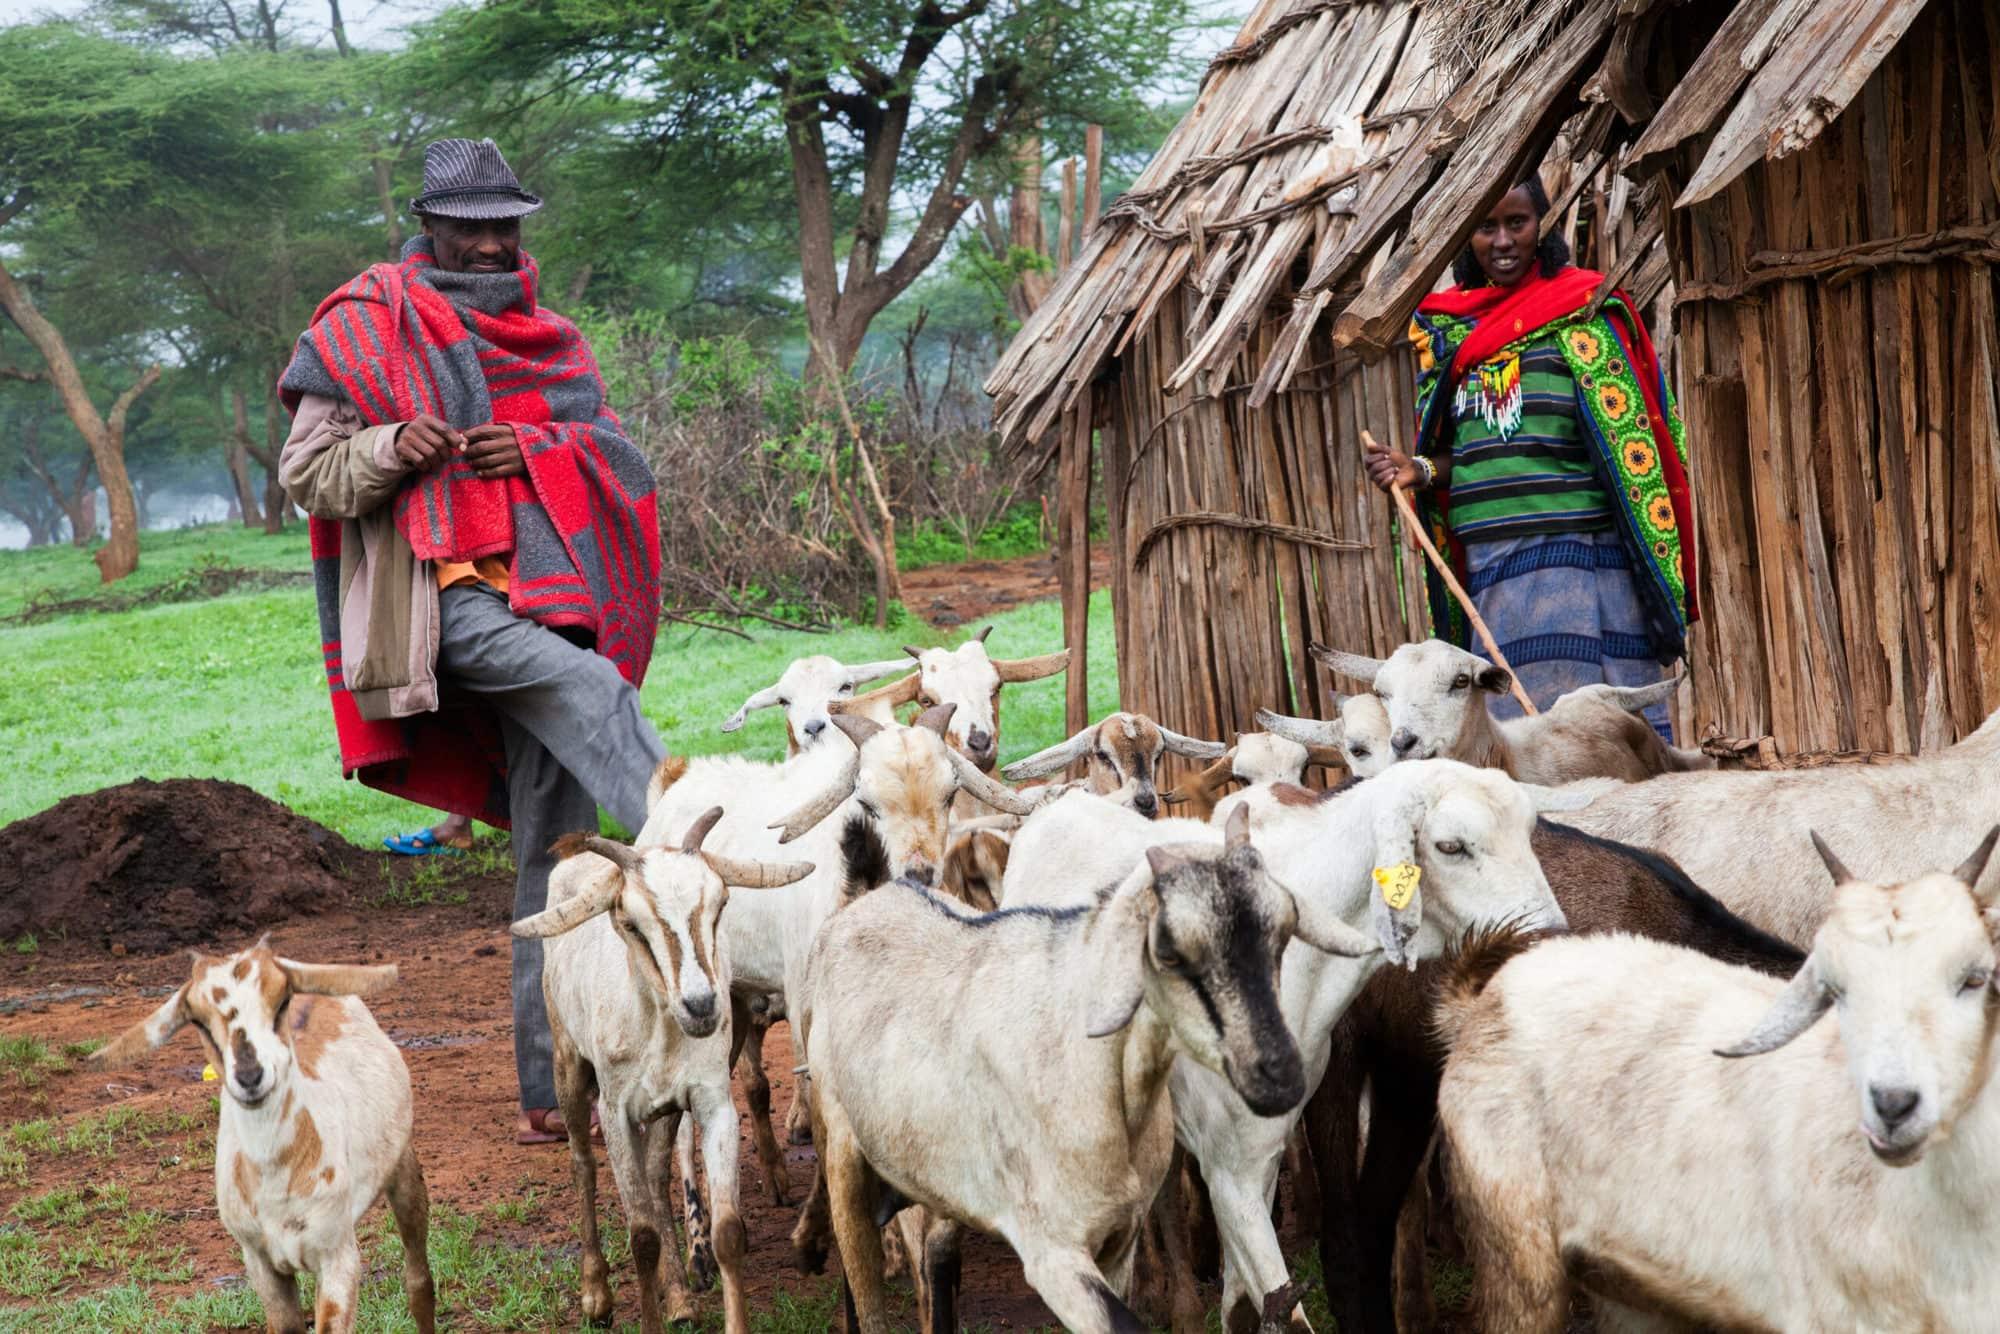 A family leads goats out for grazing in Borana, Ethiopia (photo credit: ILRI/Zerihun Sewunet)